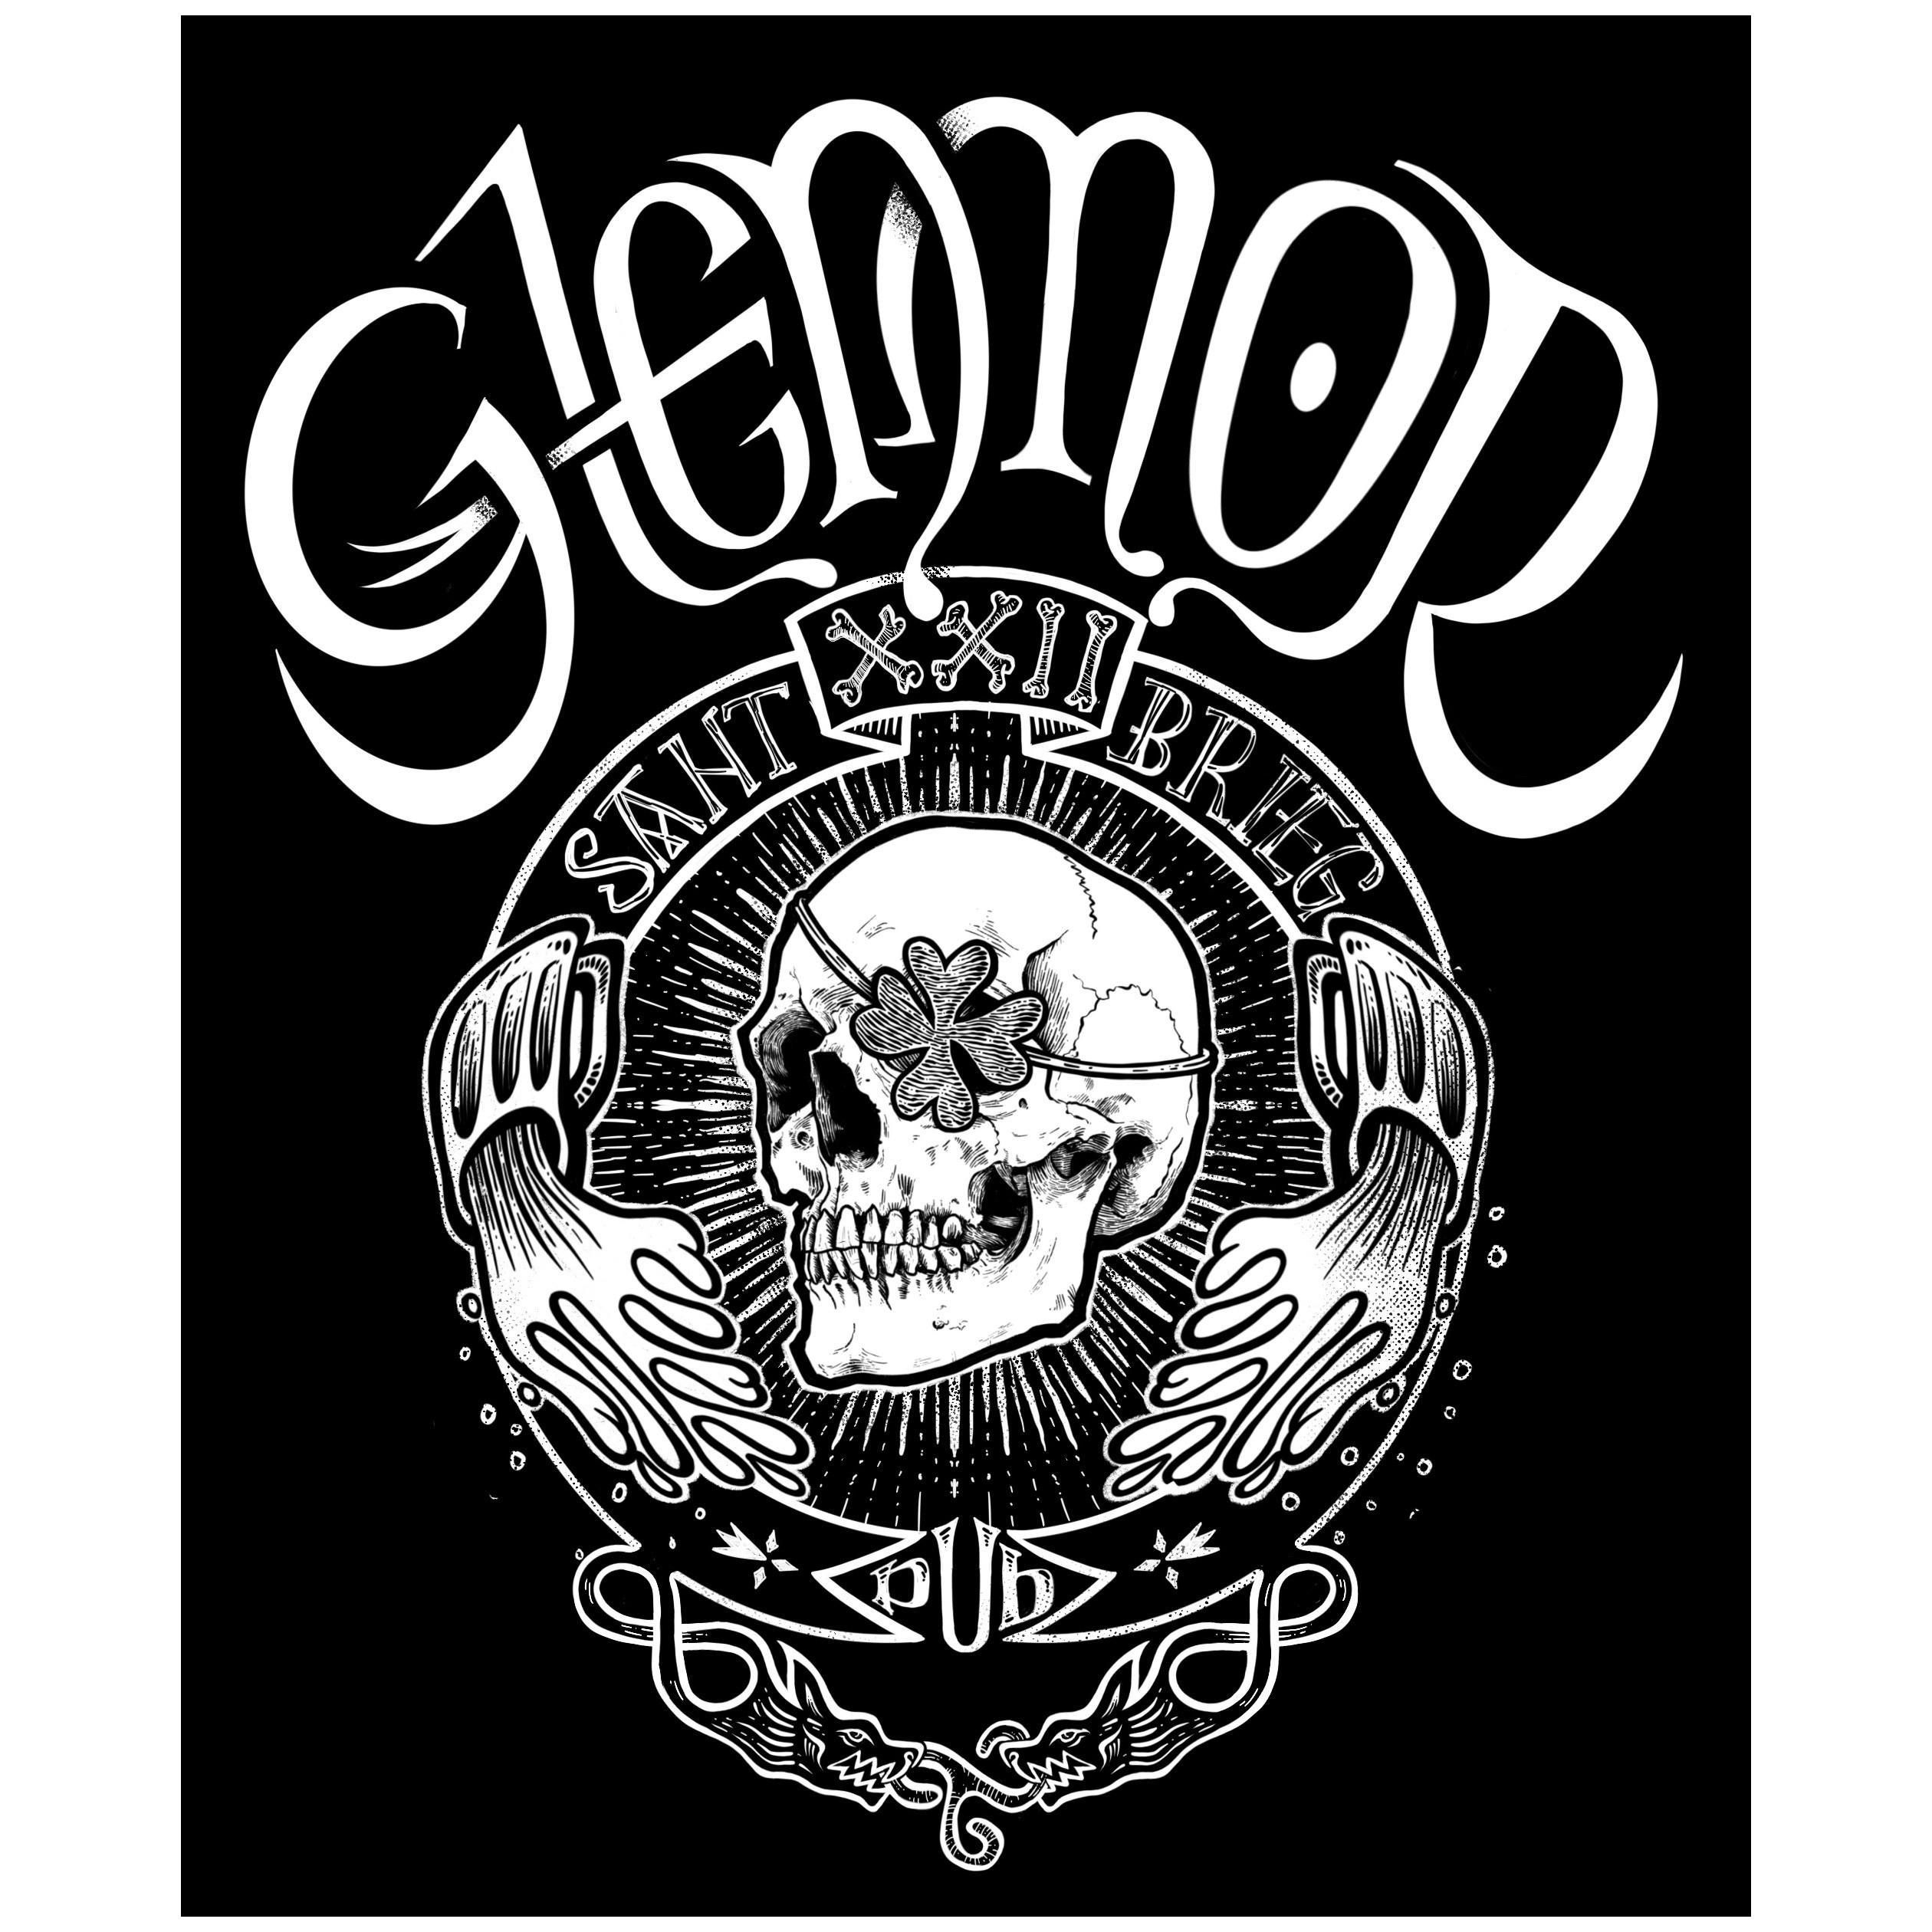 Glenmor Pub